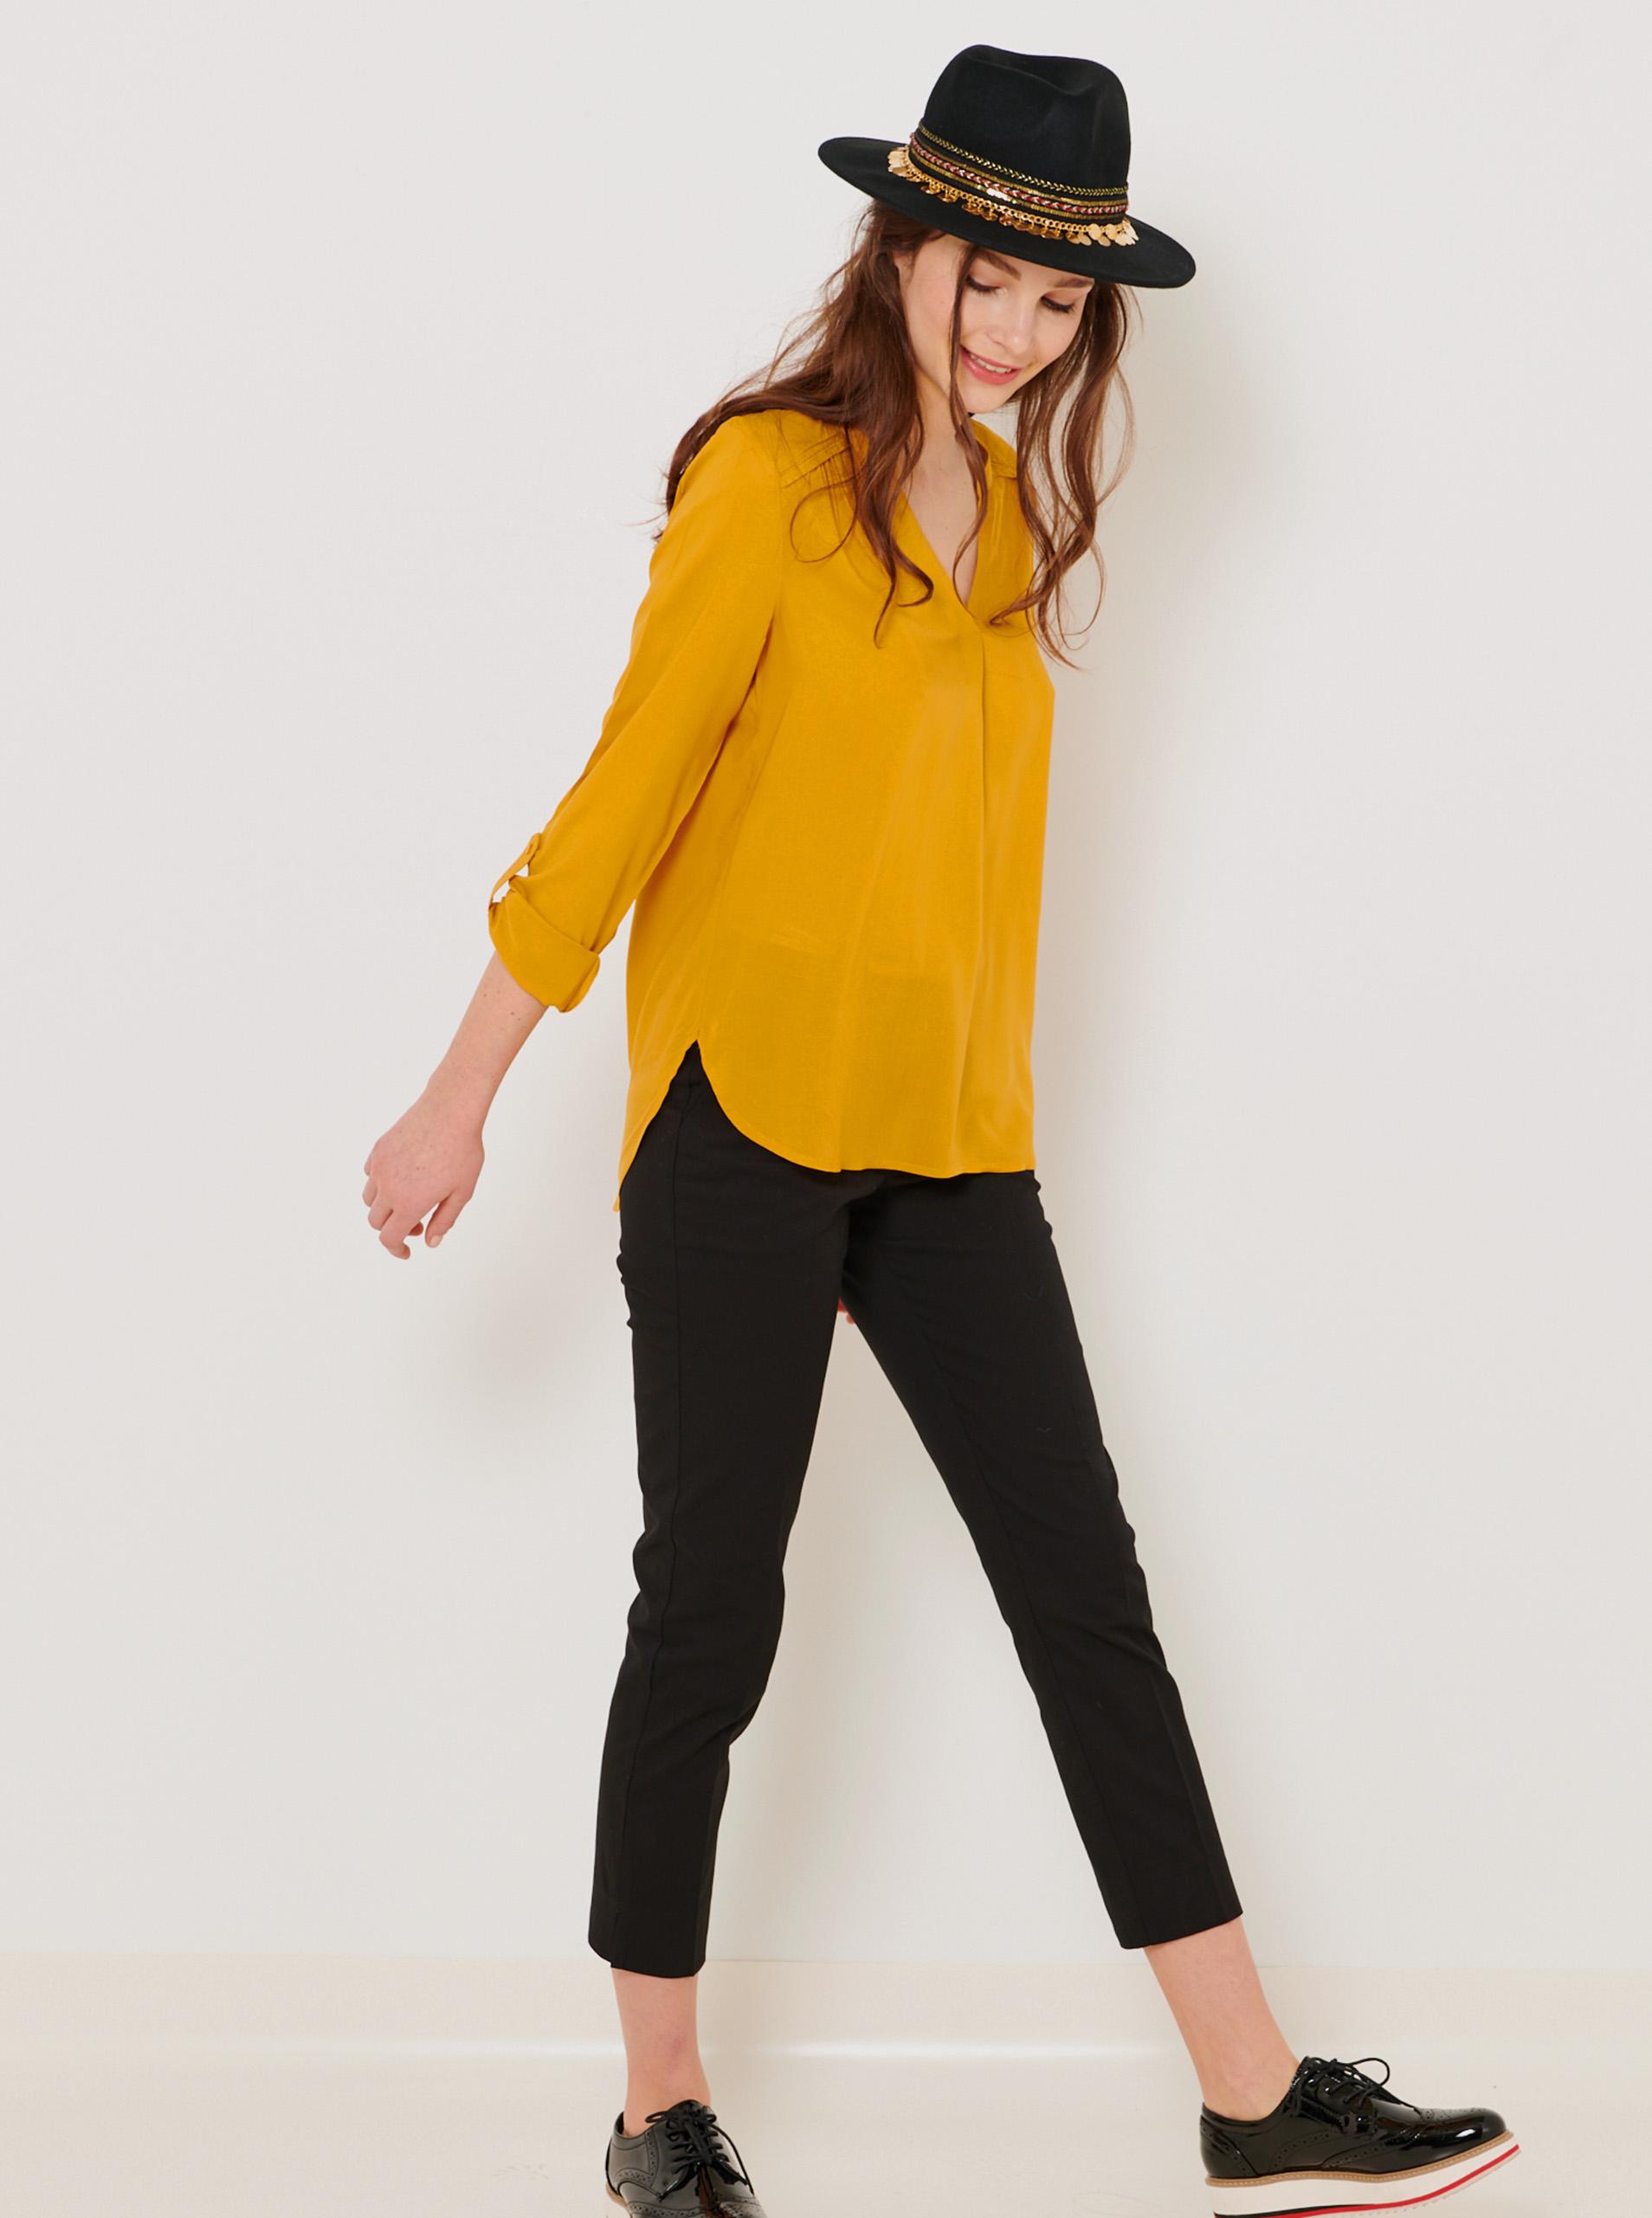 CAMAIEU Women's blouse mustard